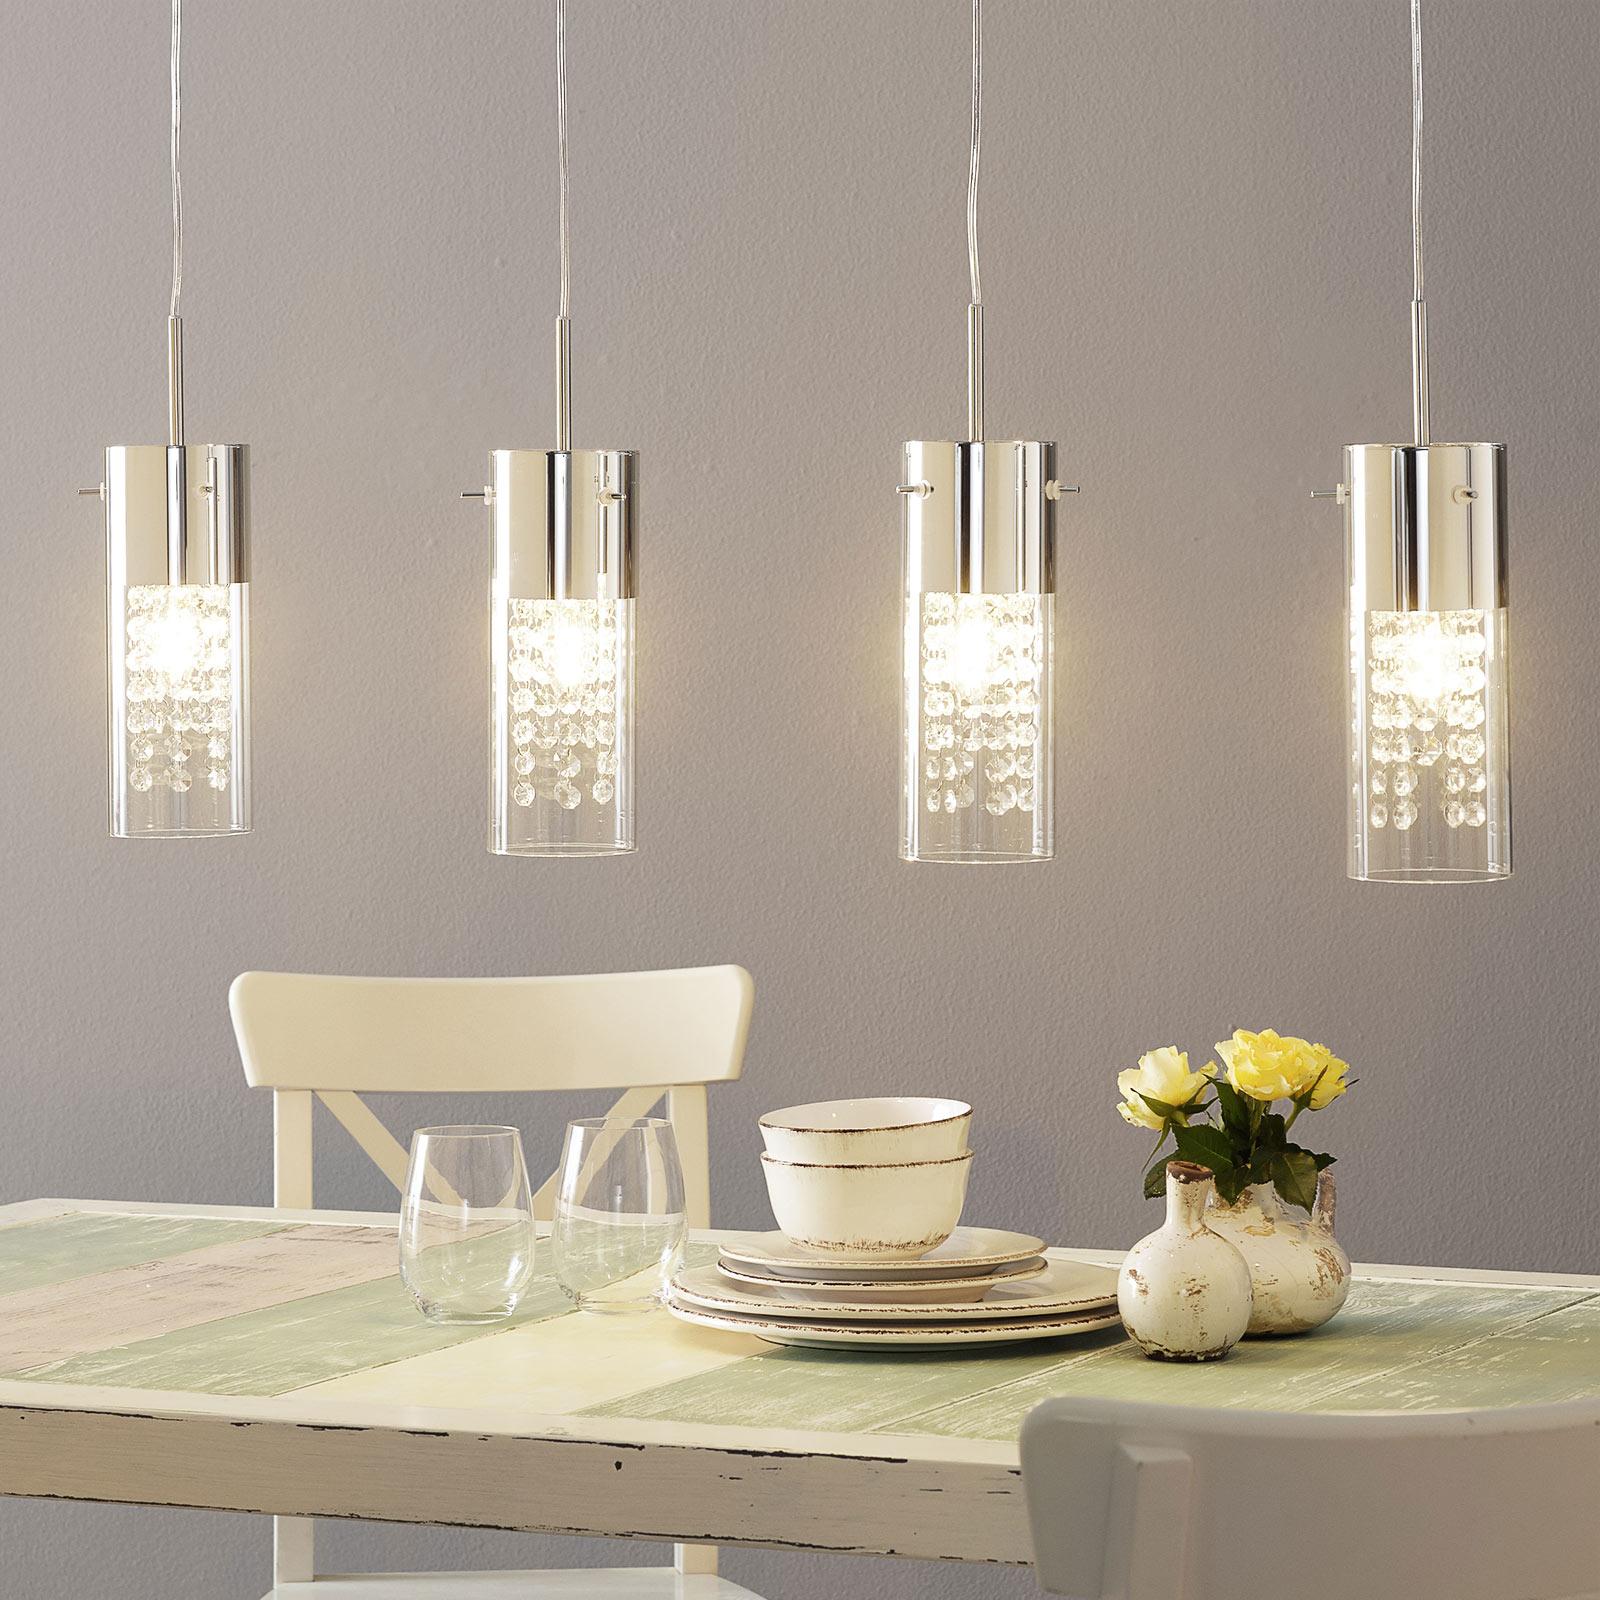 Charming pendant light Diamond 4-bulb_3001660_1